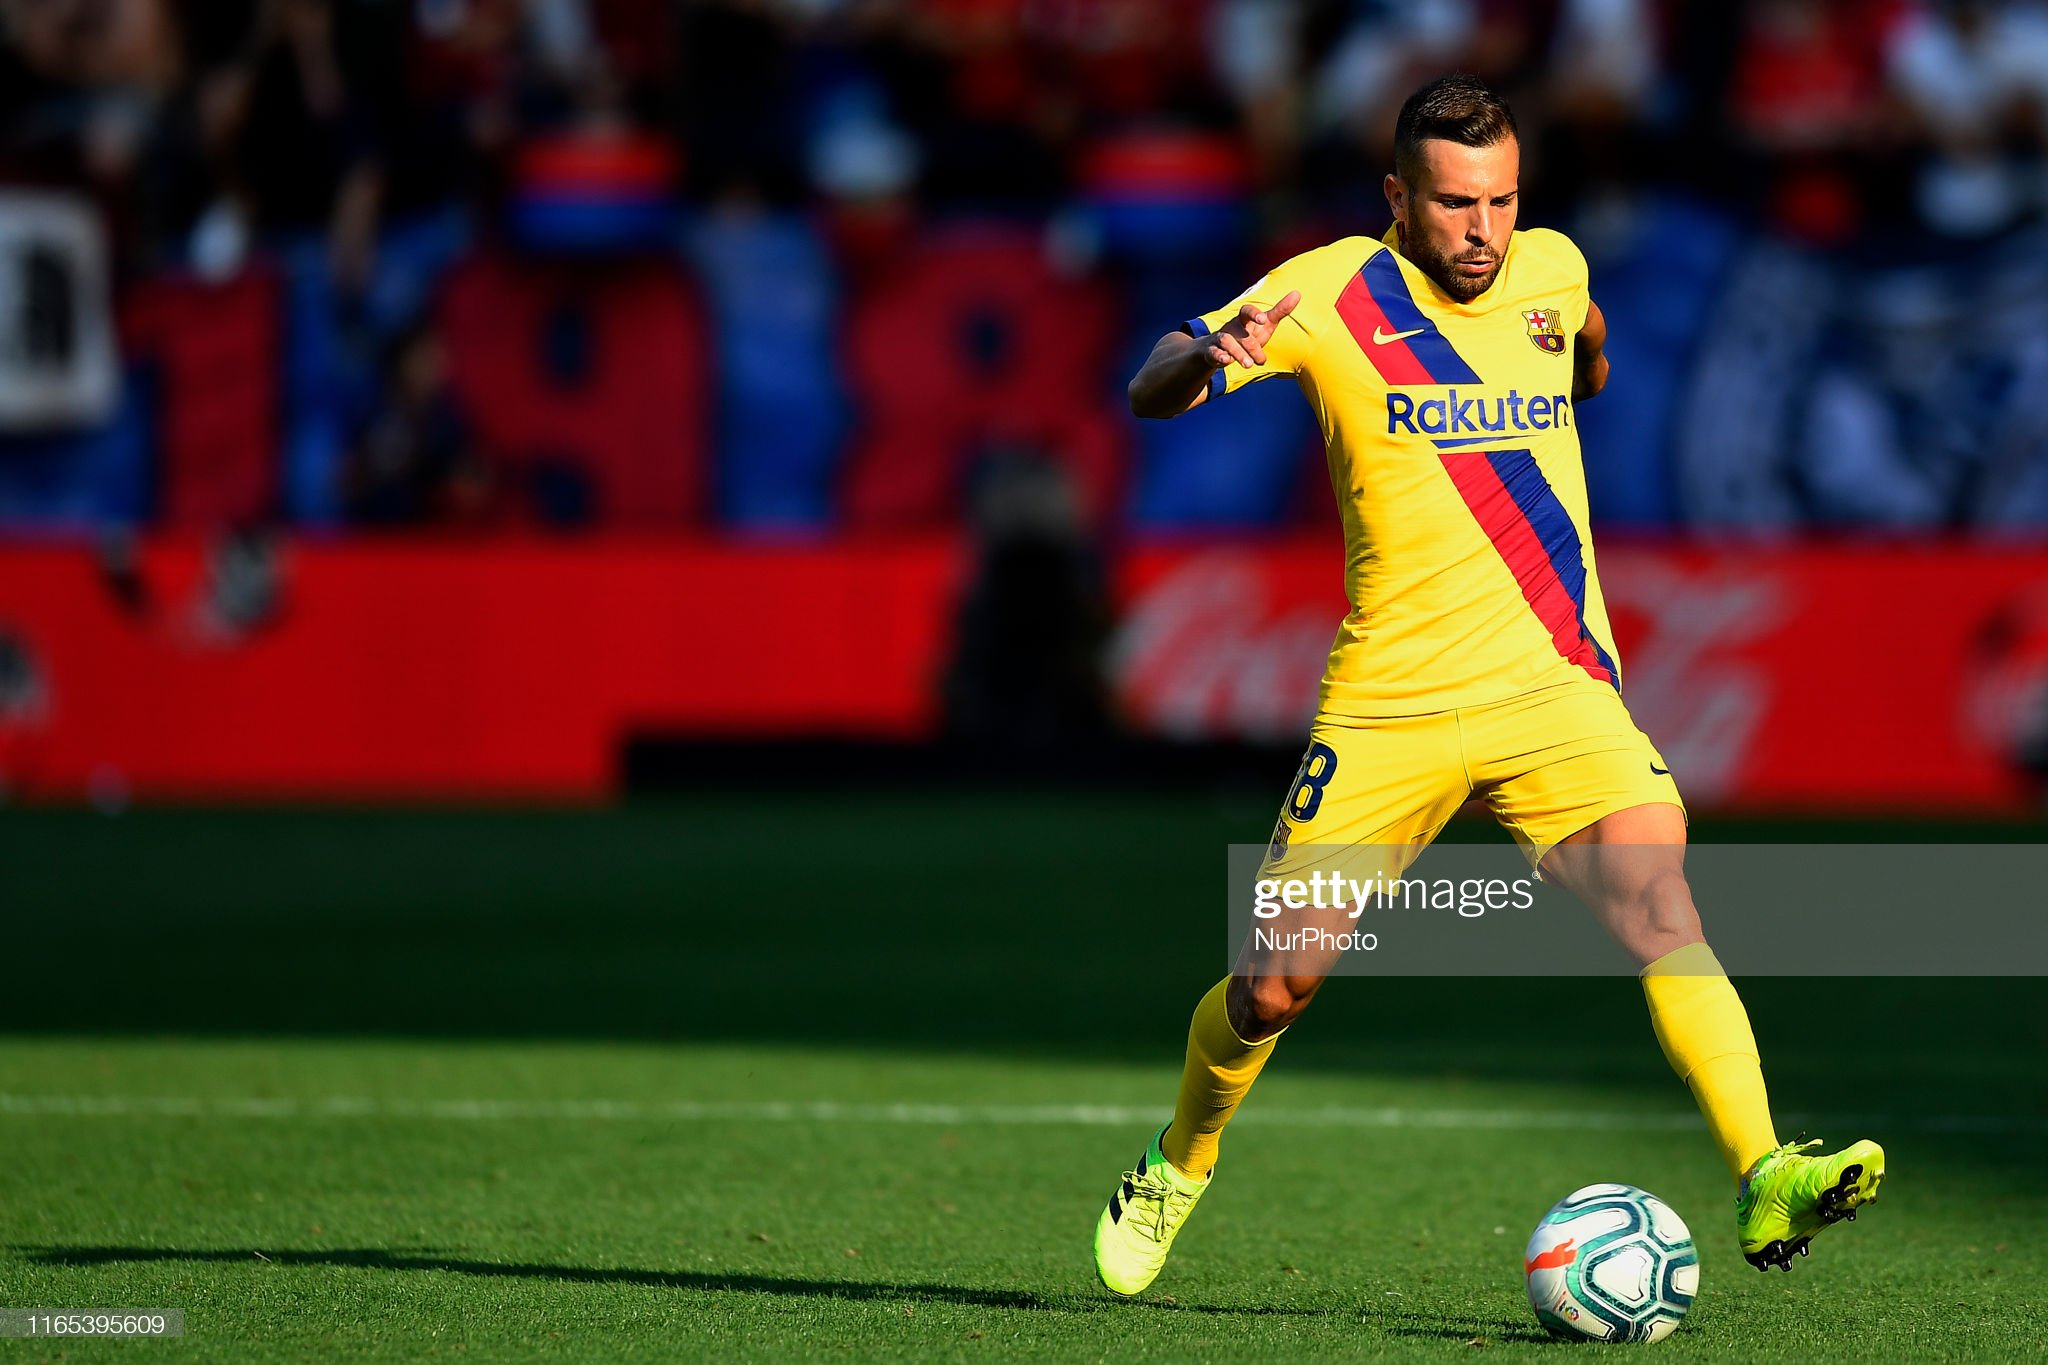 صور مباراة : أوساسونا - برشلونة 2-2 ( 31-08-2019 )  Jordi-alba-of-barcelona-controls-the-ball-during-the-liga-match-ca-picture-id1165395609?s=2048x2048